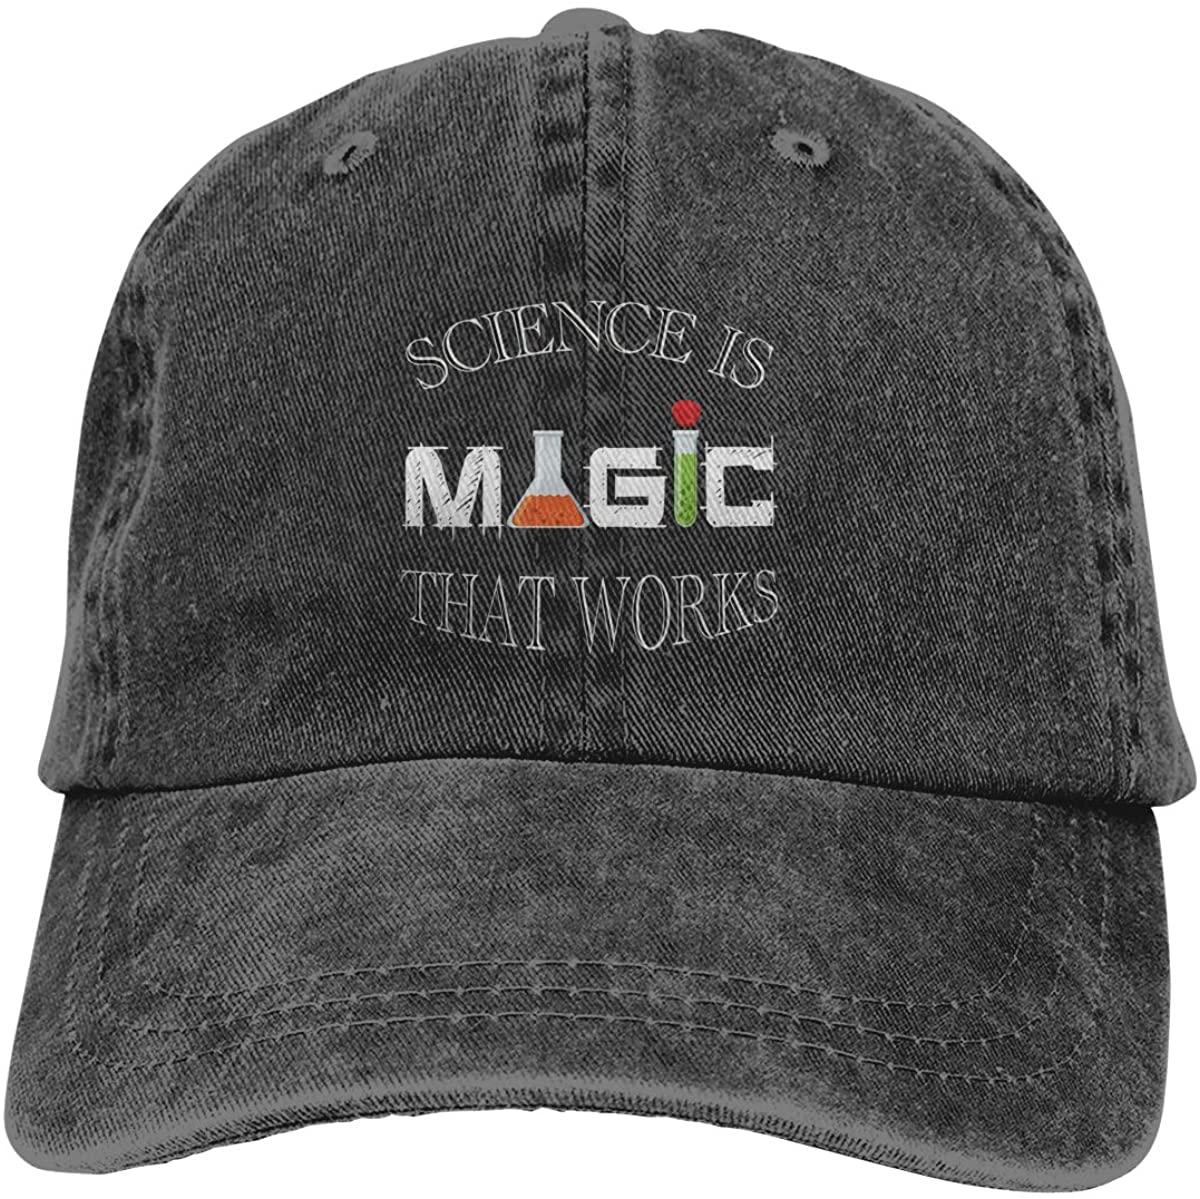 Kelo Science is Magic That Works Adjustable Unisex Hat Baseball Caps Black